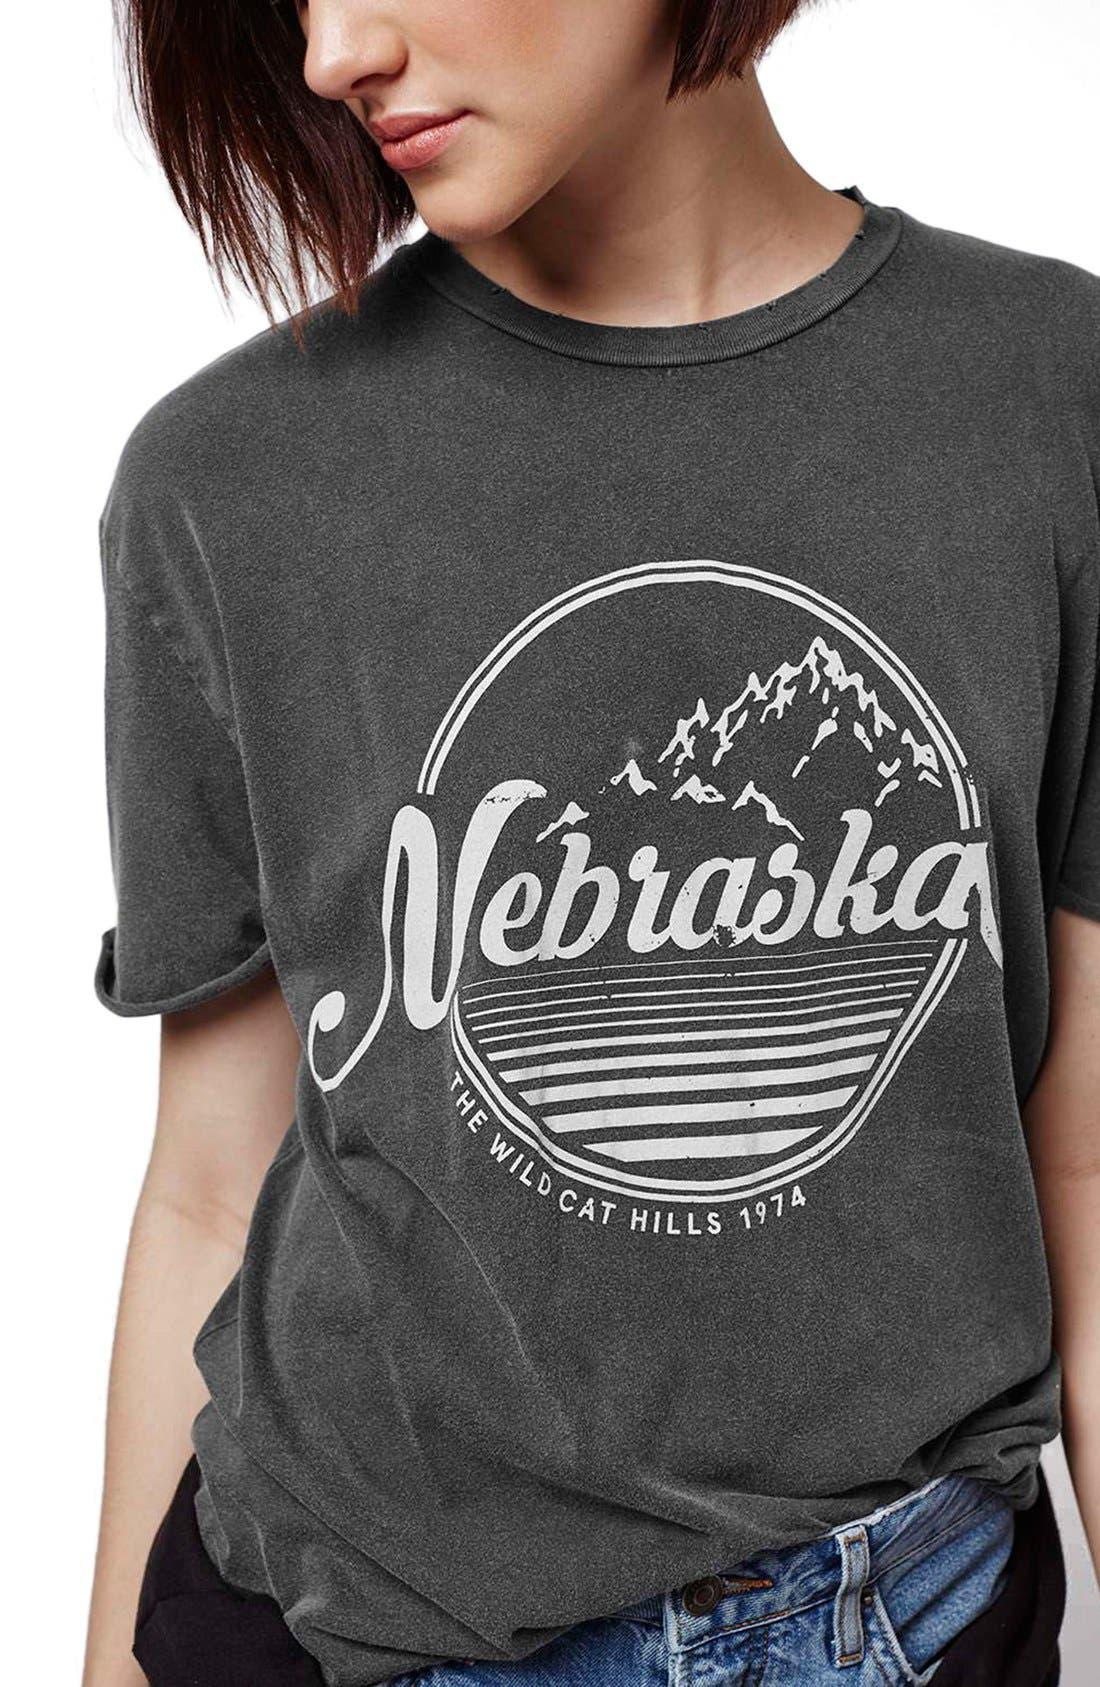 'Nebraska' Graphic Tee,                             Alternate thumbnail 2, color,                             020